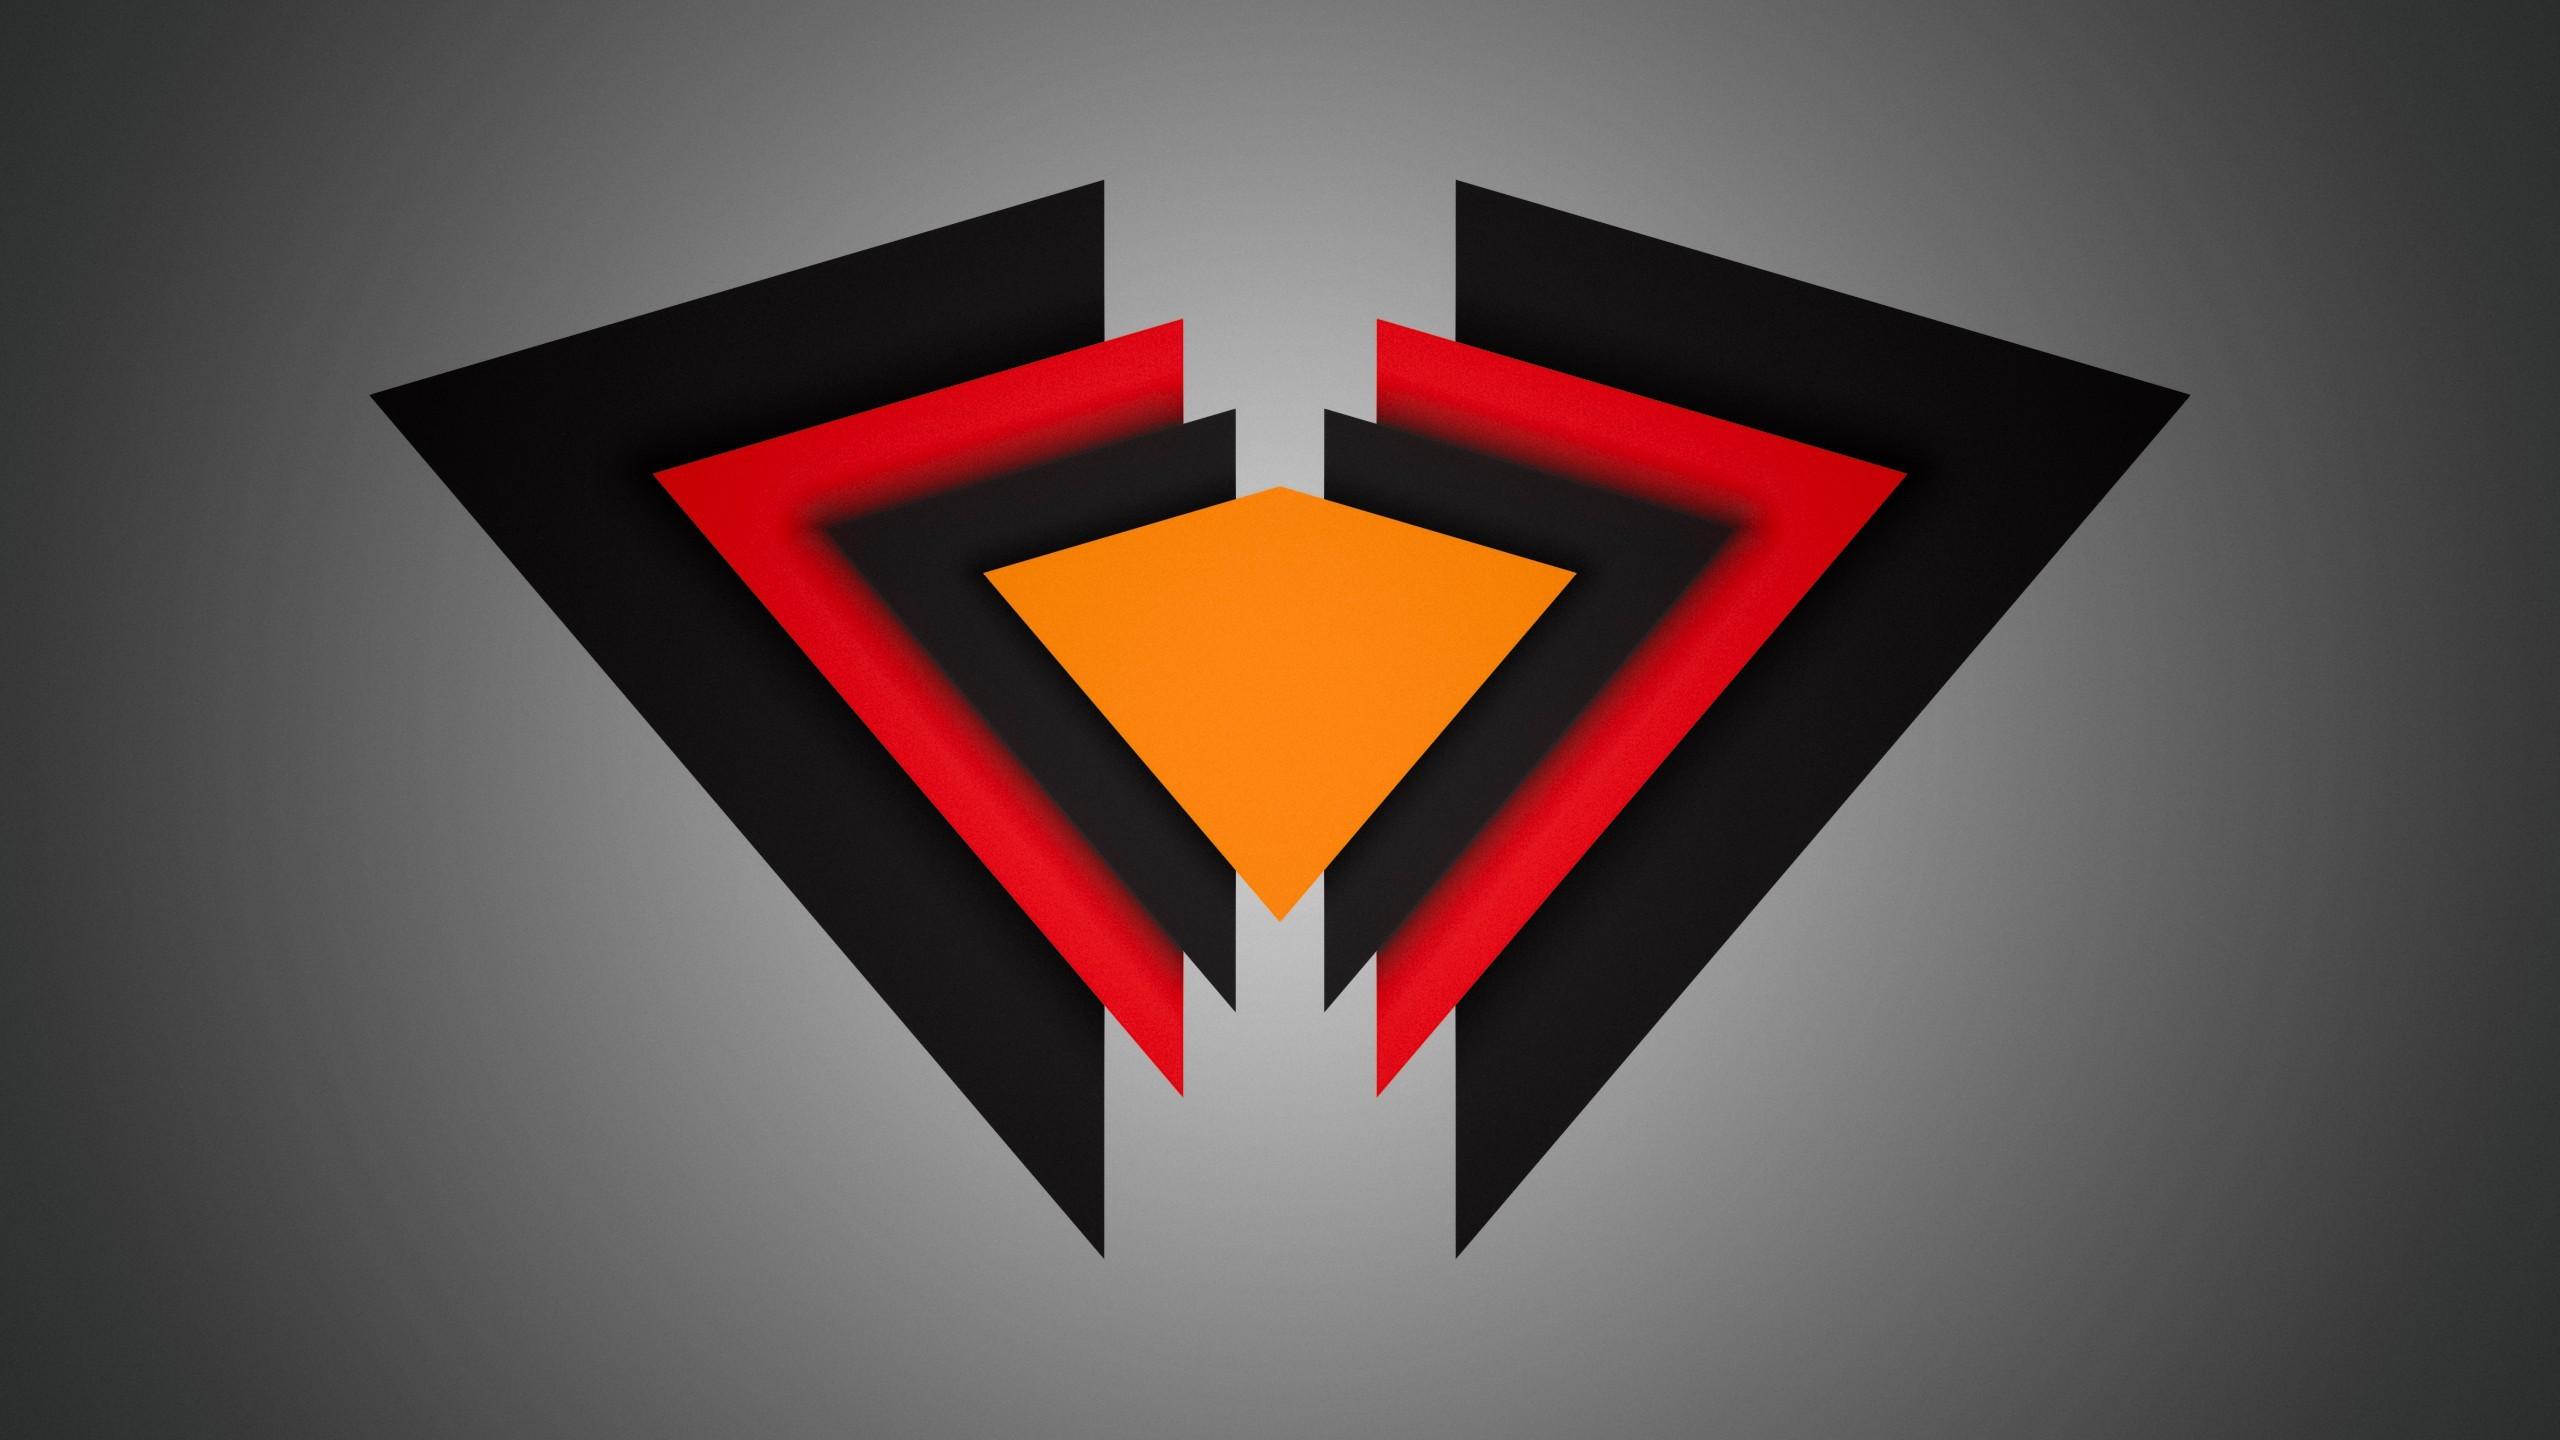 General triangle material minimal red black orange vignette